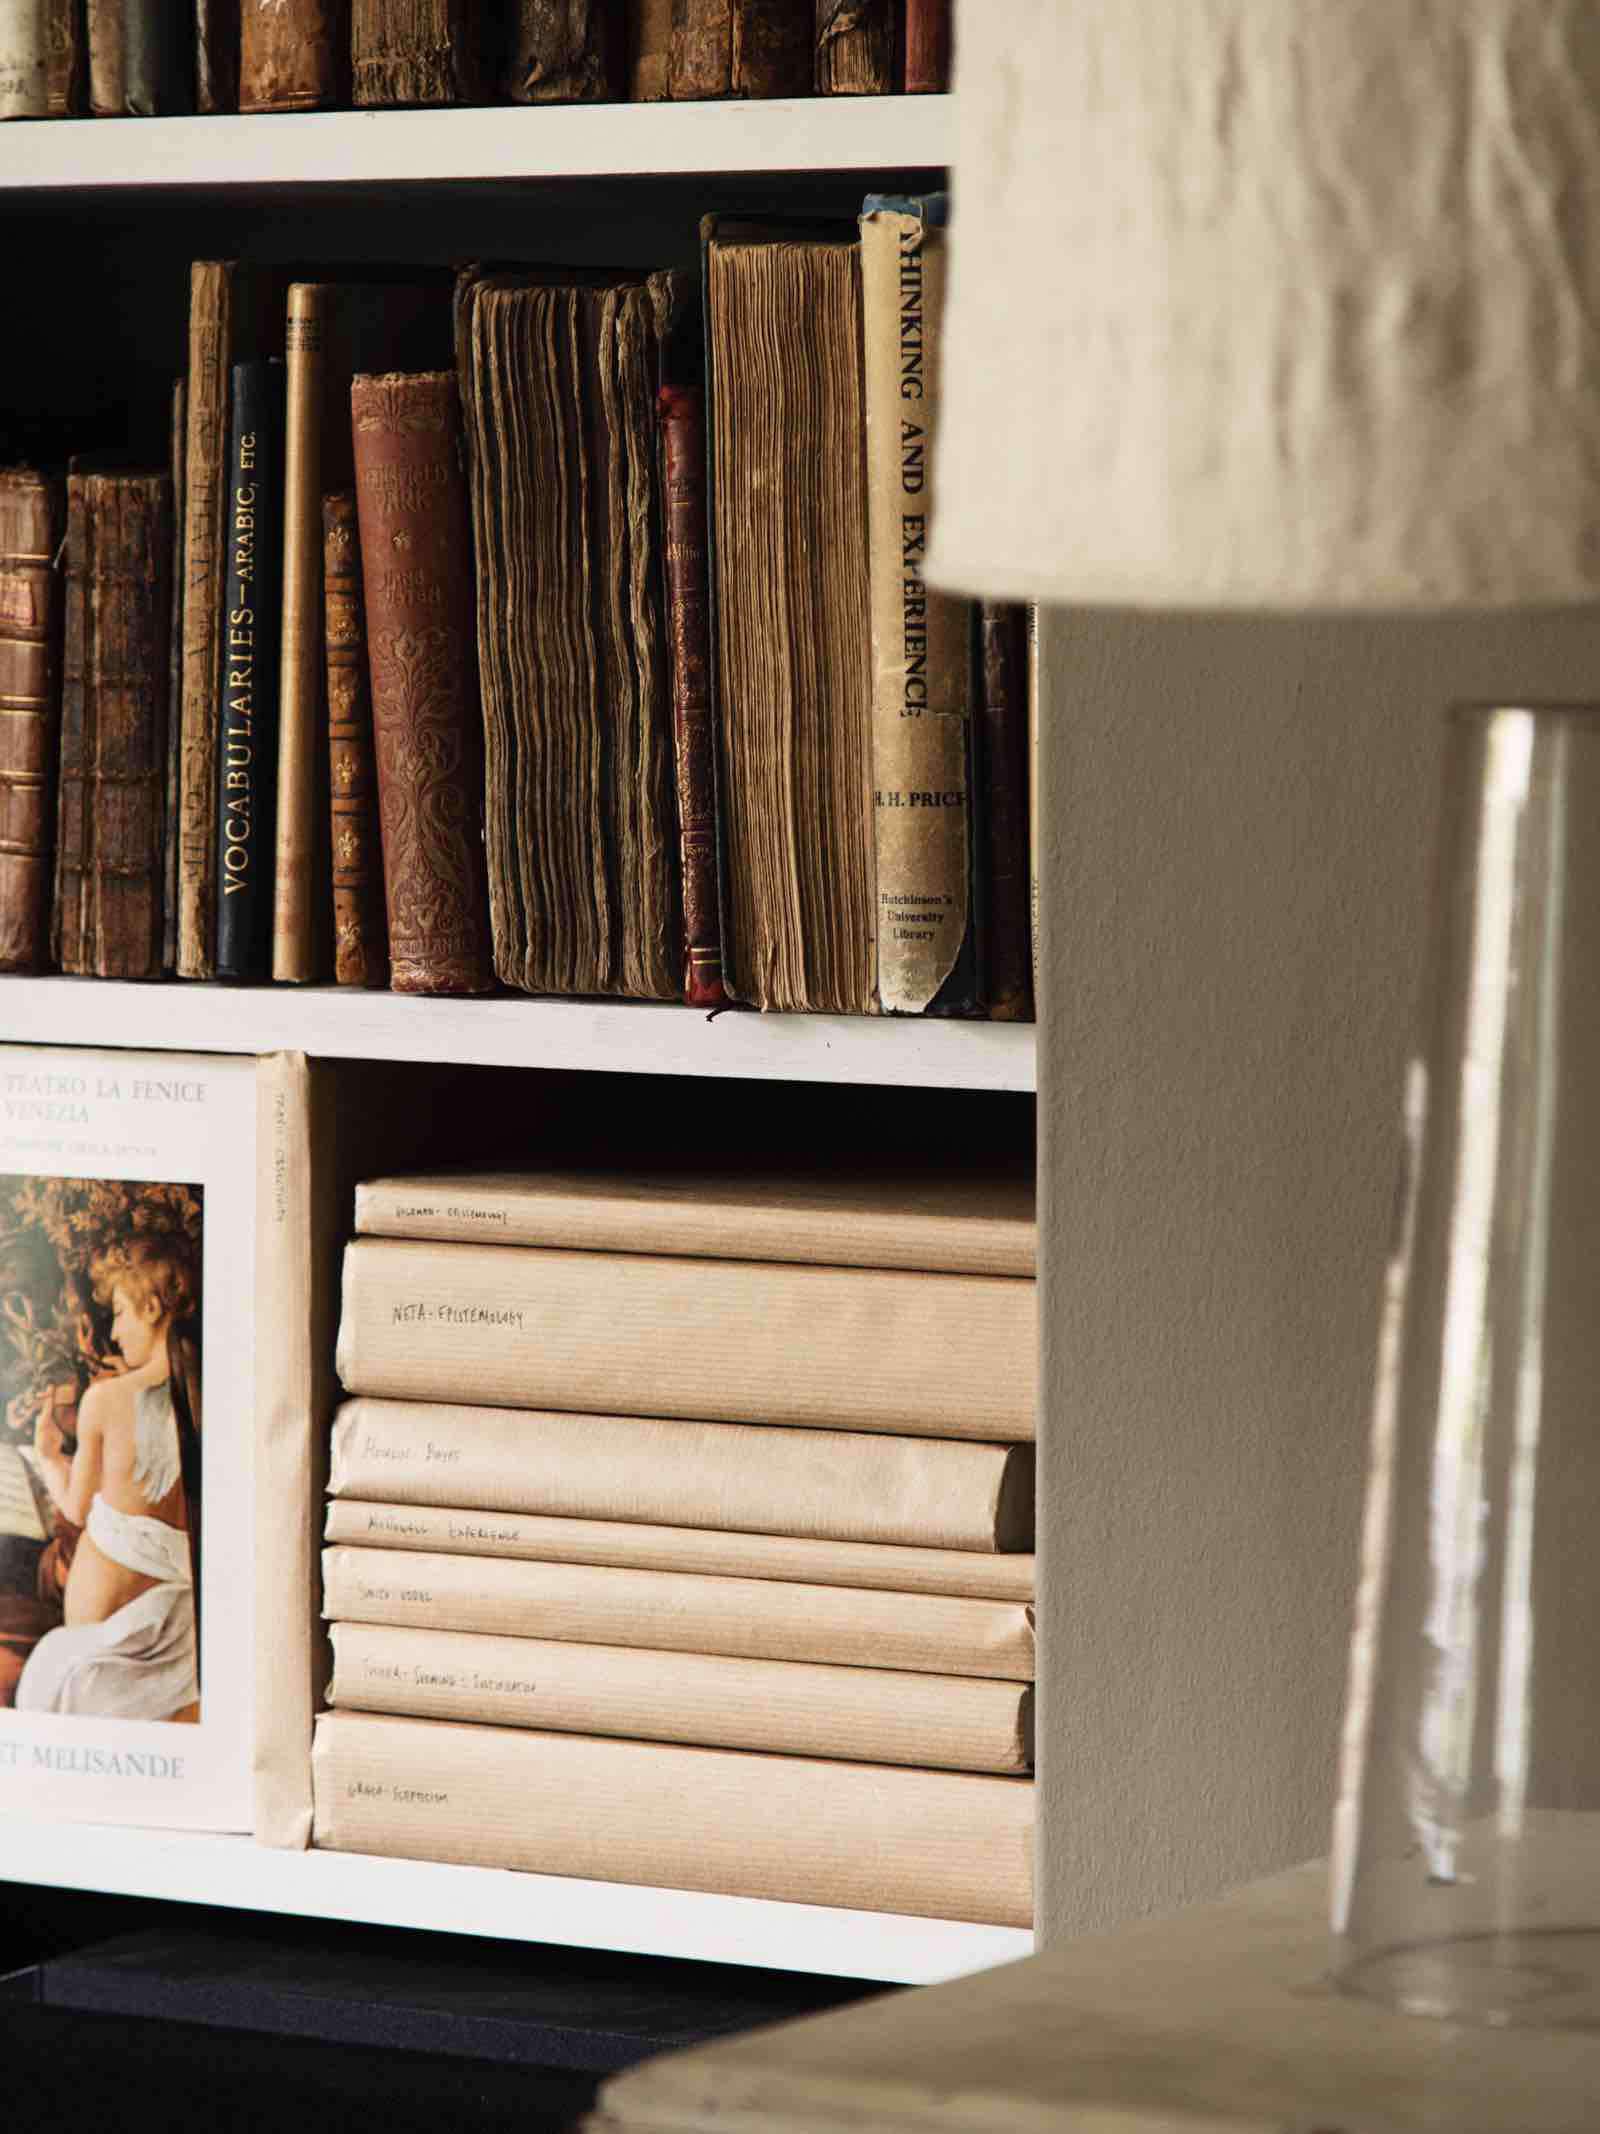 House Call A Textile Artist At Home On The Hampstead Heath